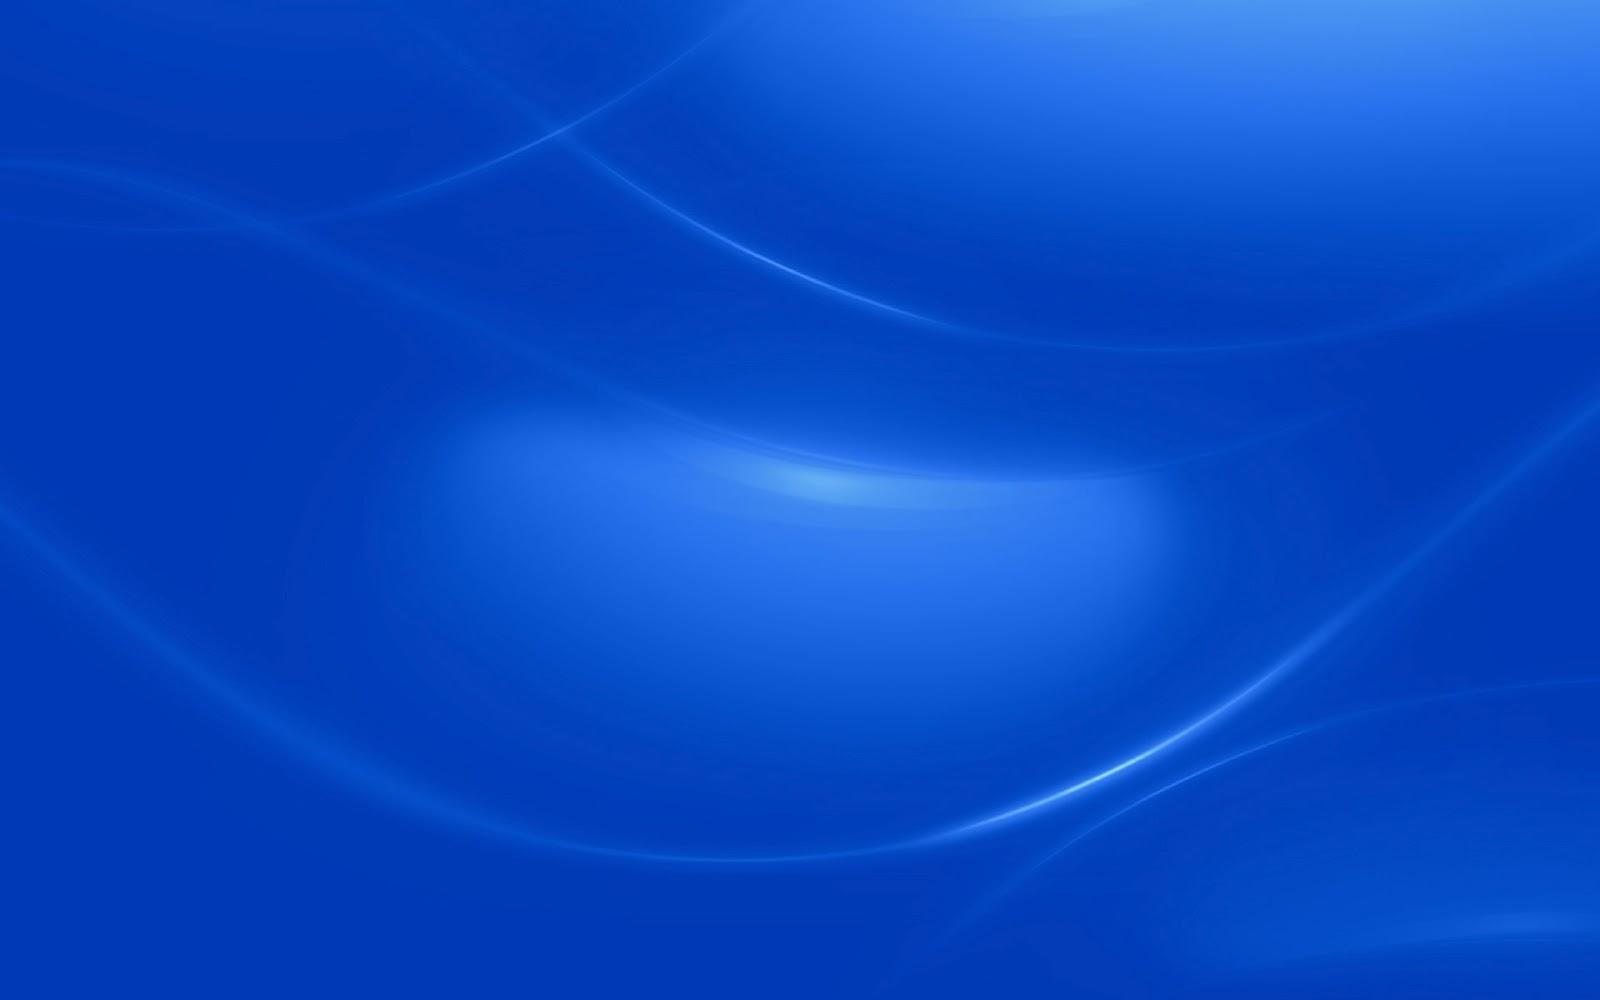 How to Change the Windows7 Logon Screen 1600x1000